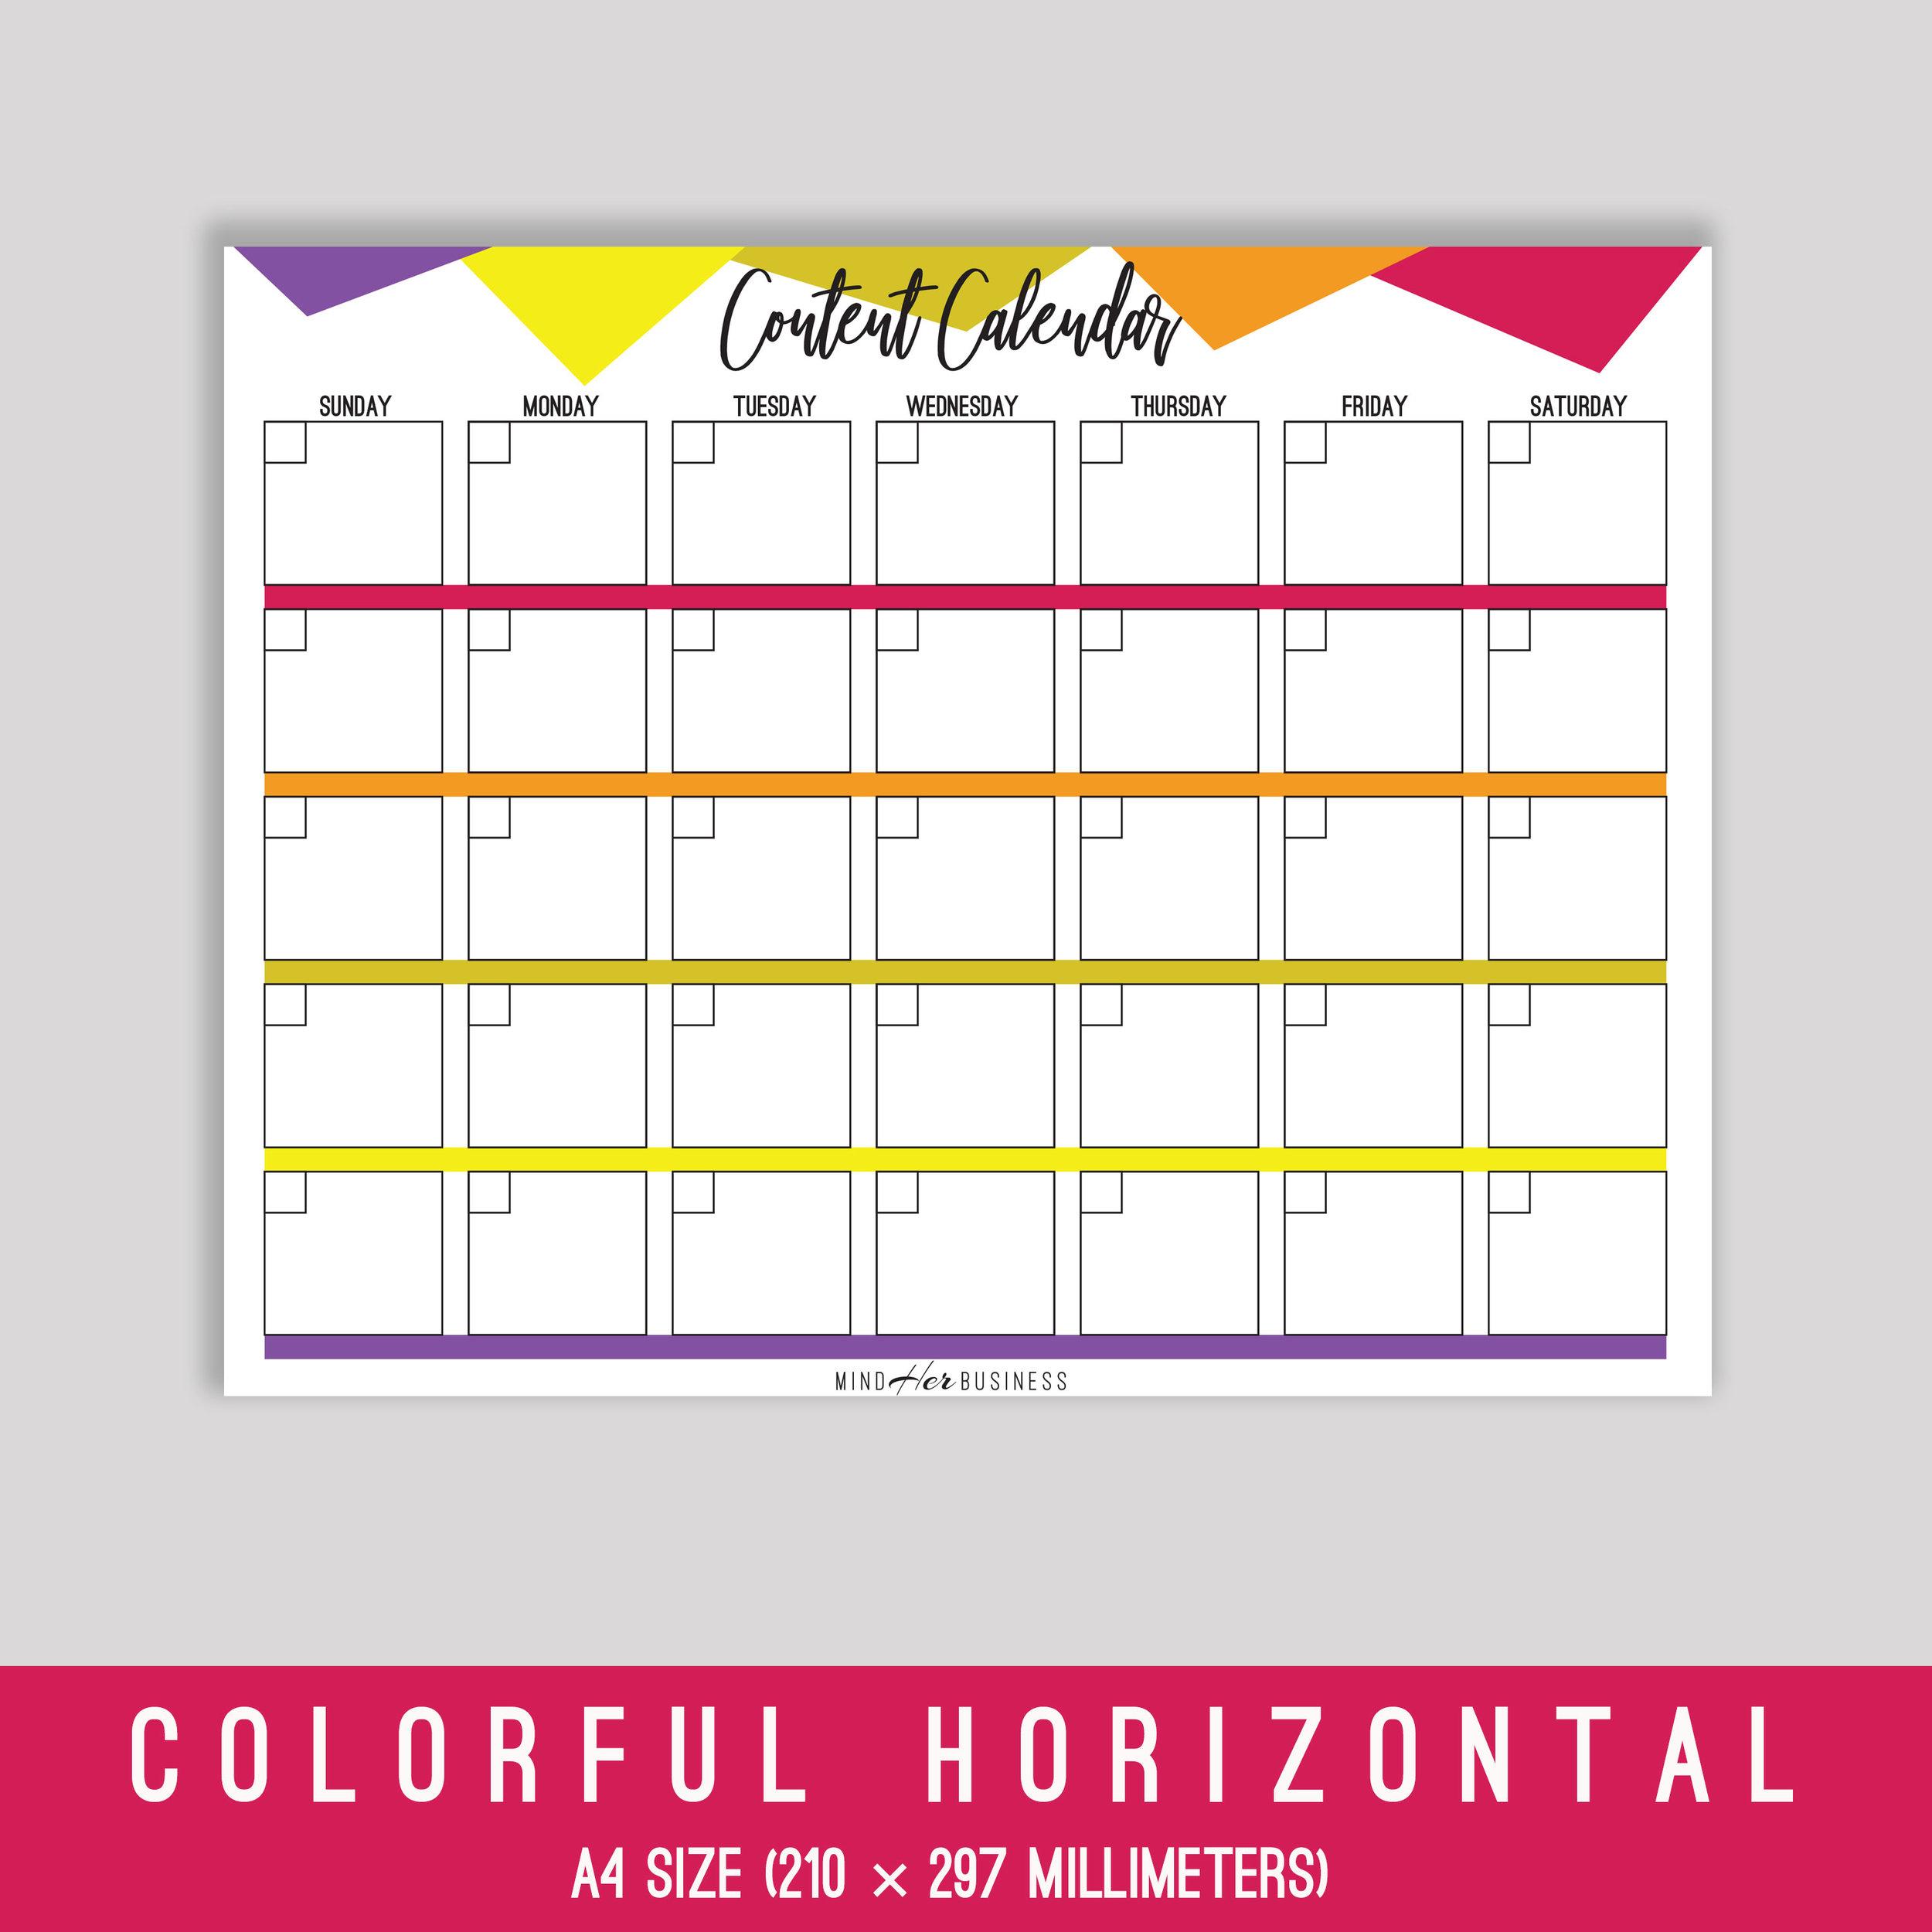 mhb-calendar-mockup-colorful-horizontal-a4.jpg